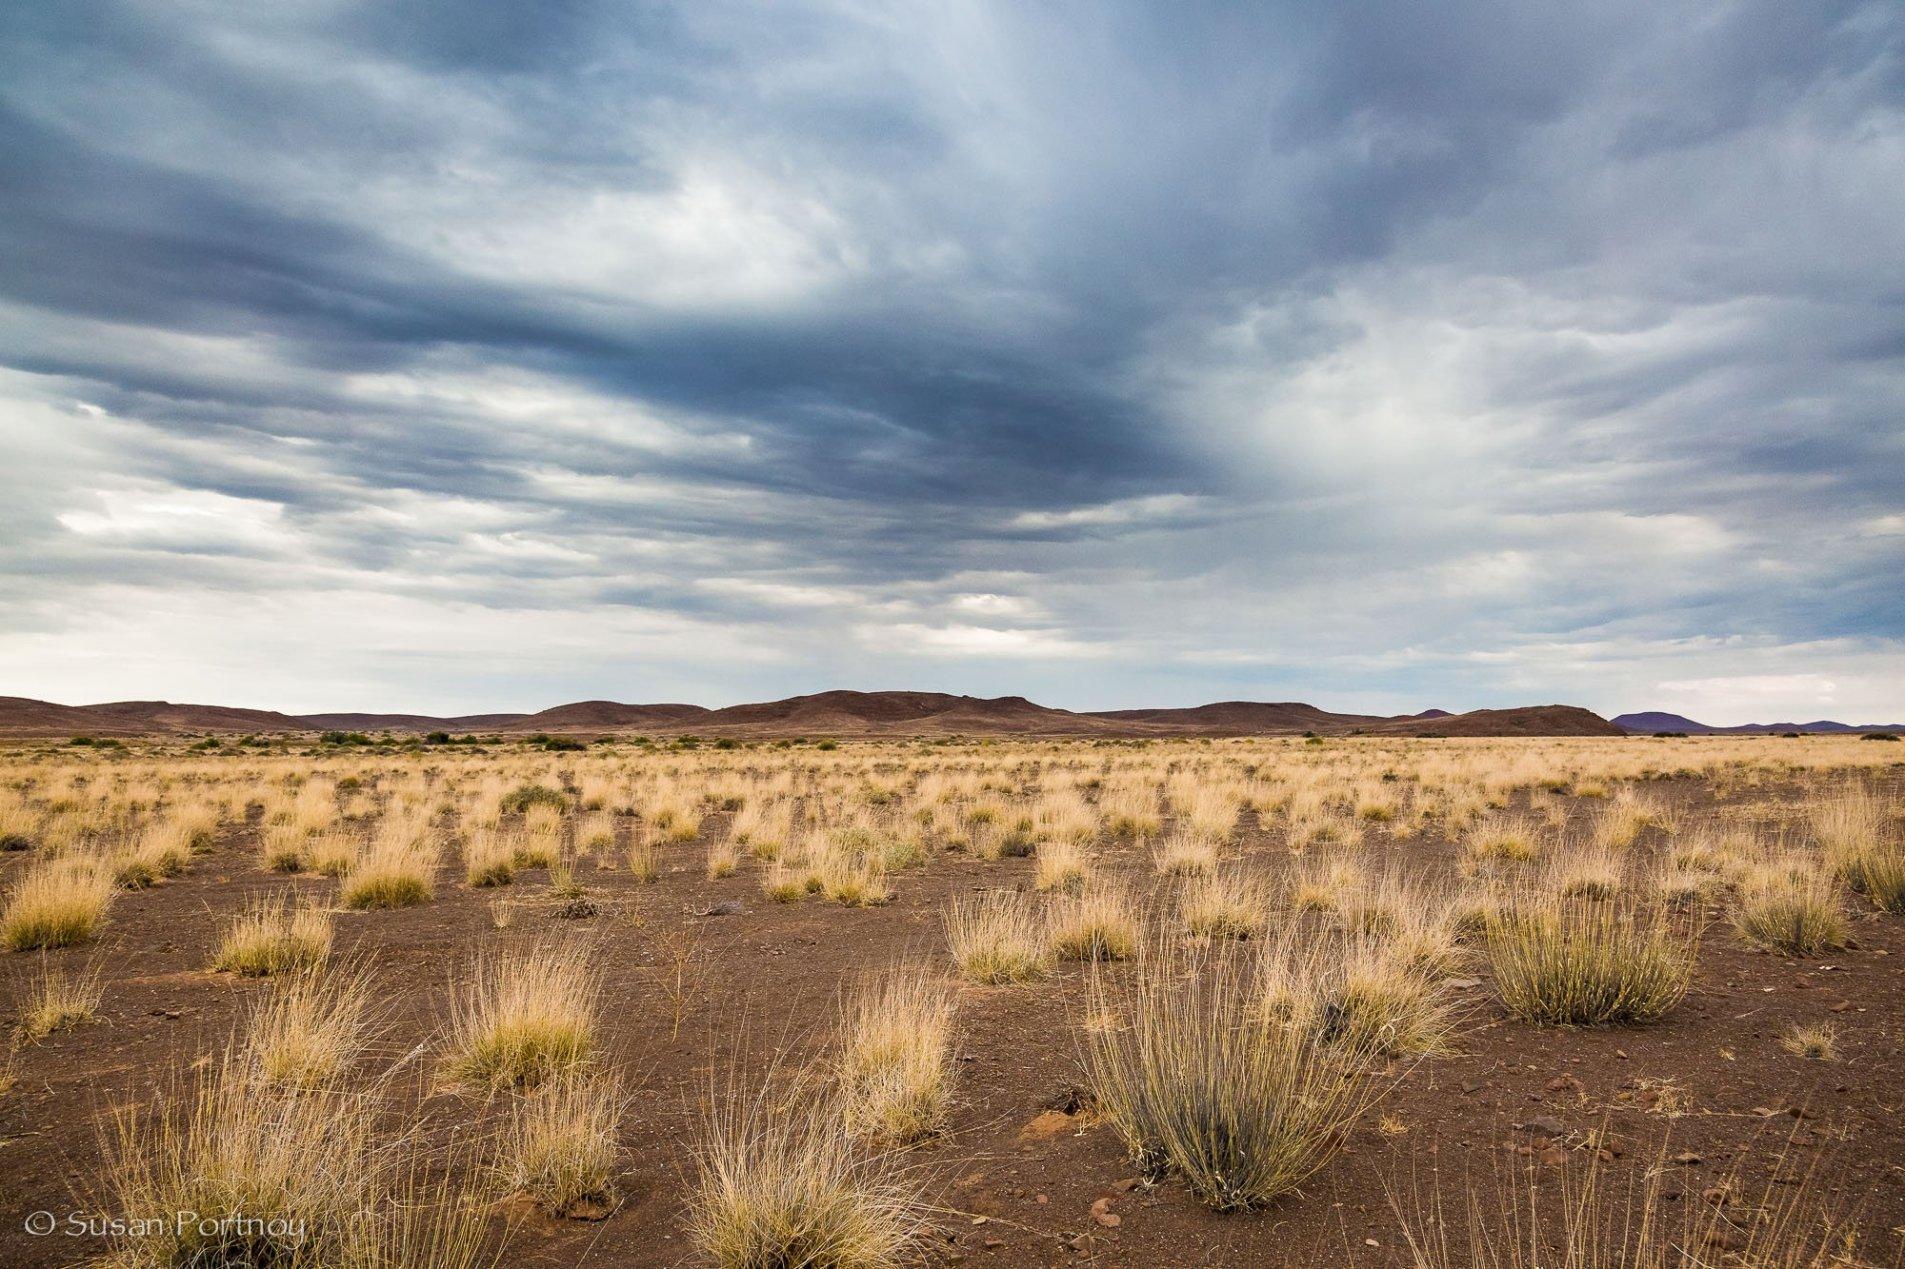 The rocky plains around Desert Rhino Camp in Namibia